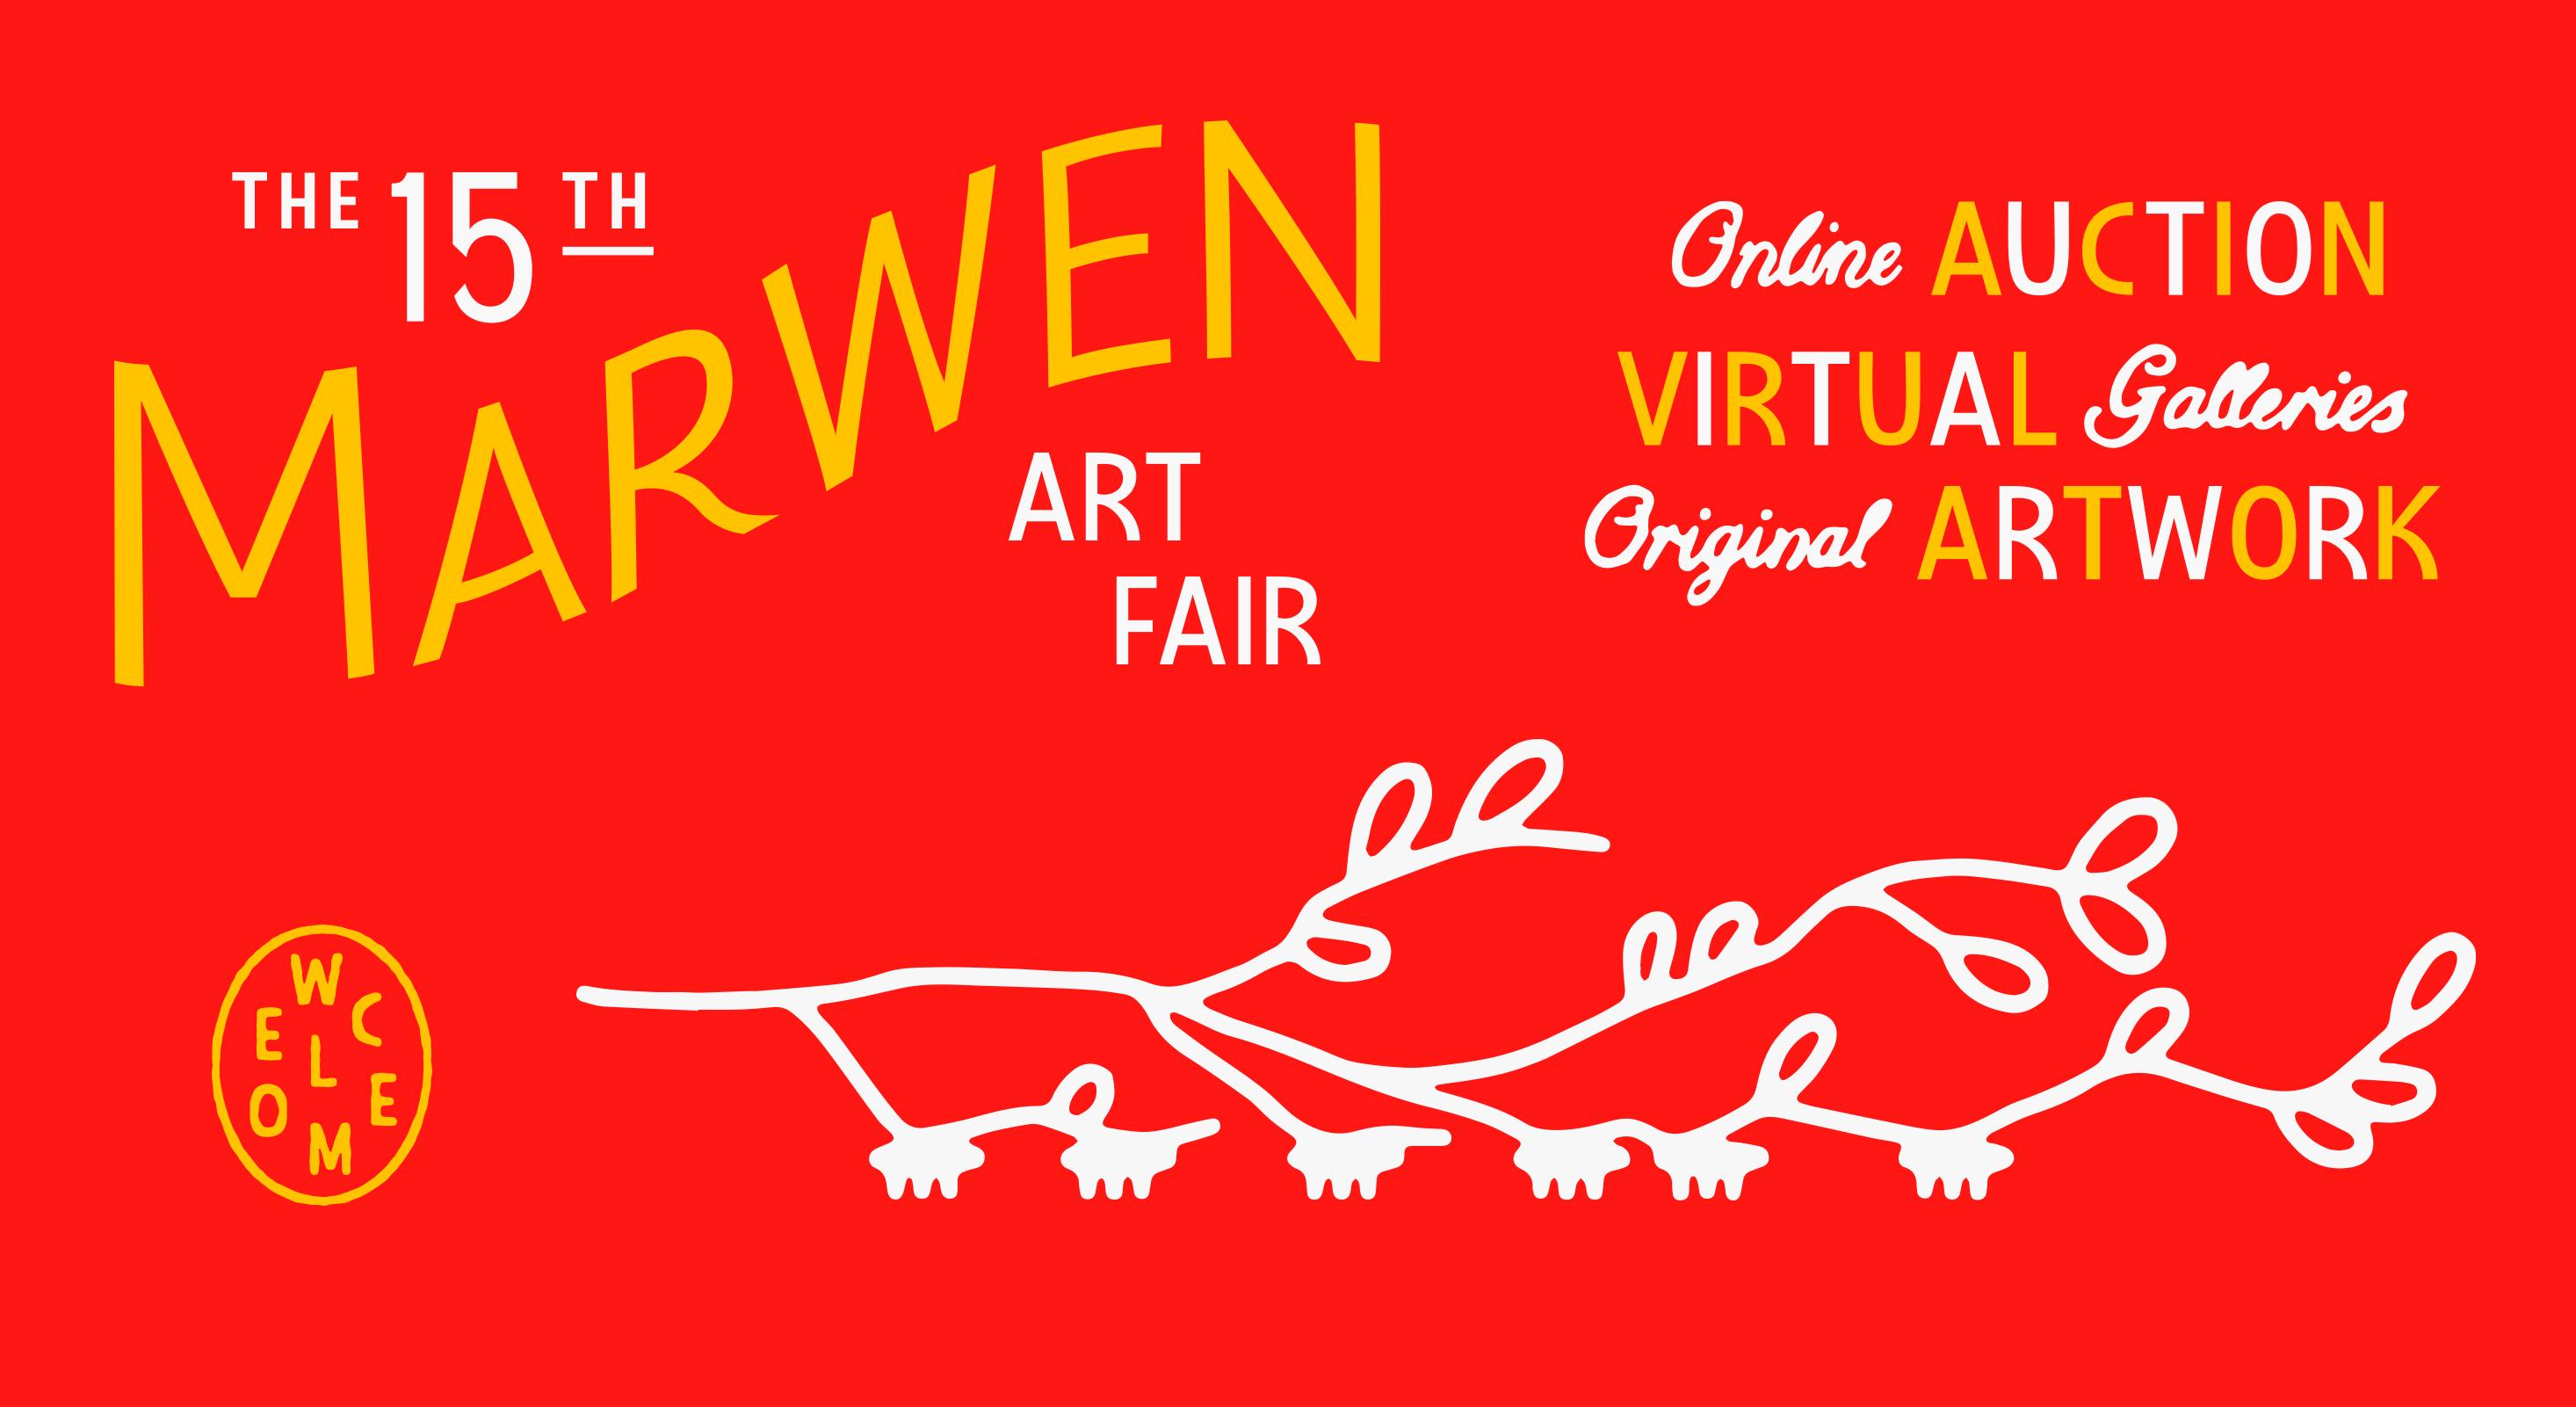 Art Fair promo red